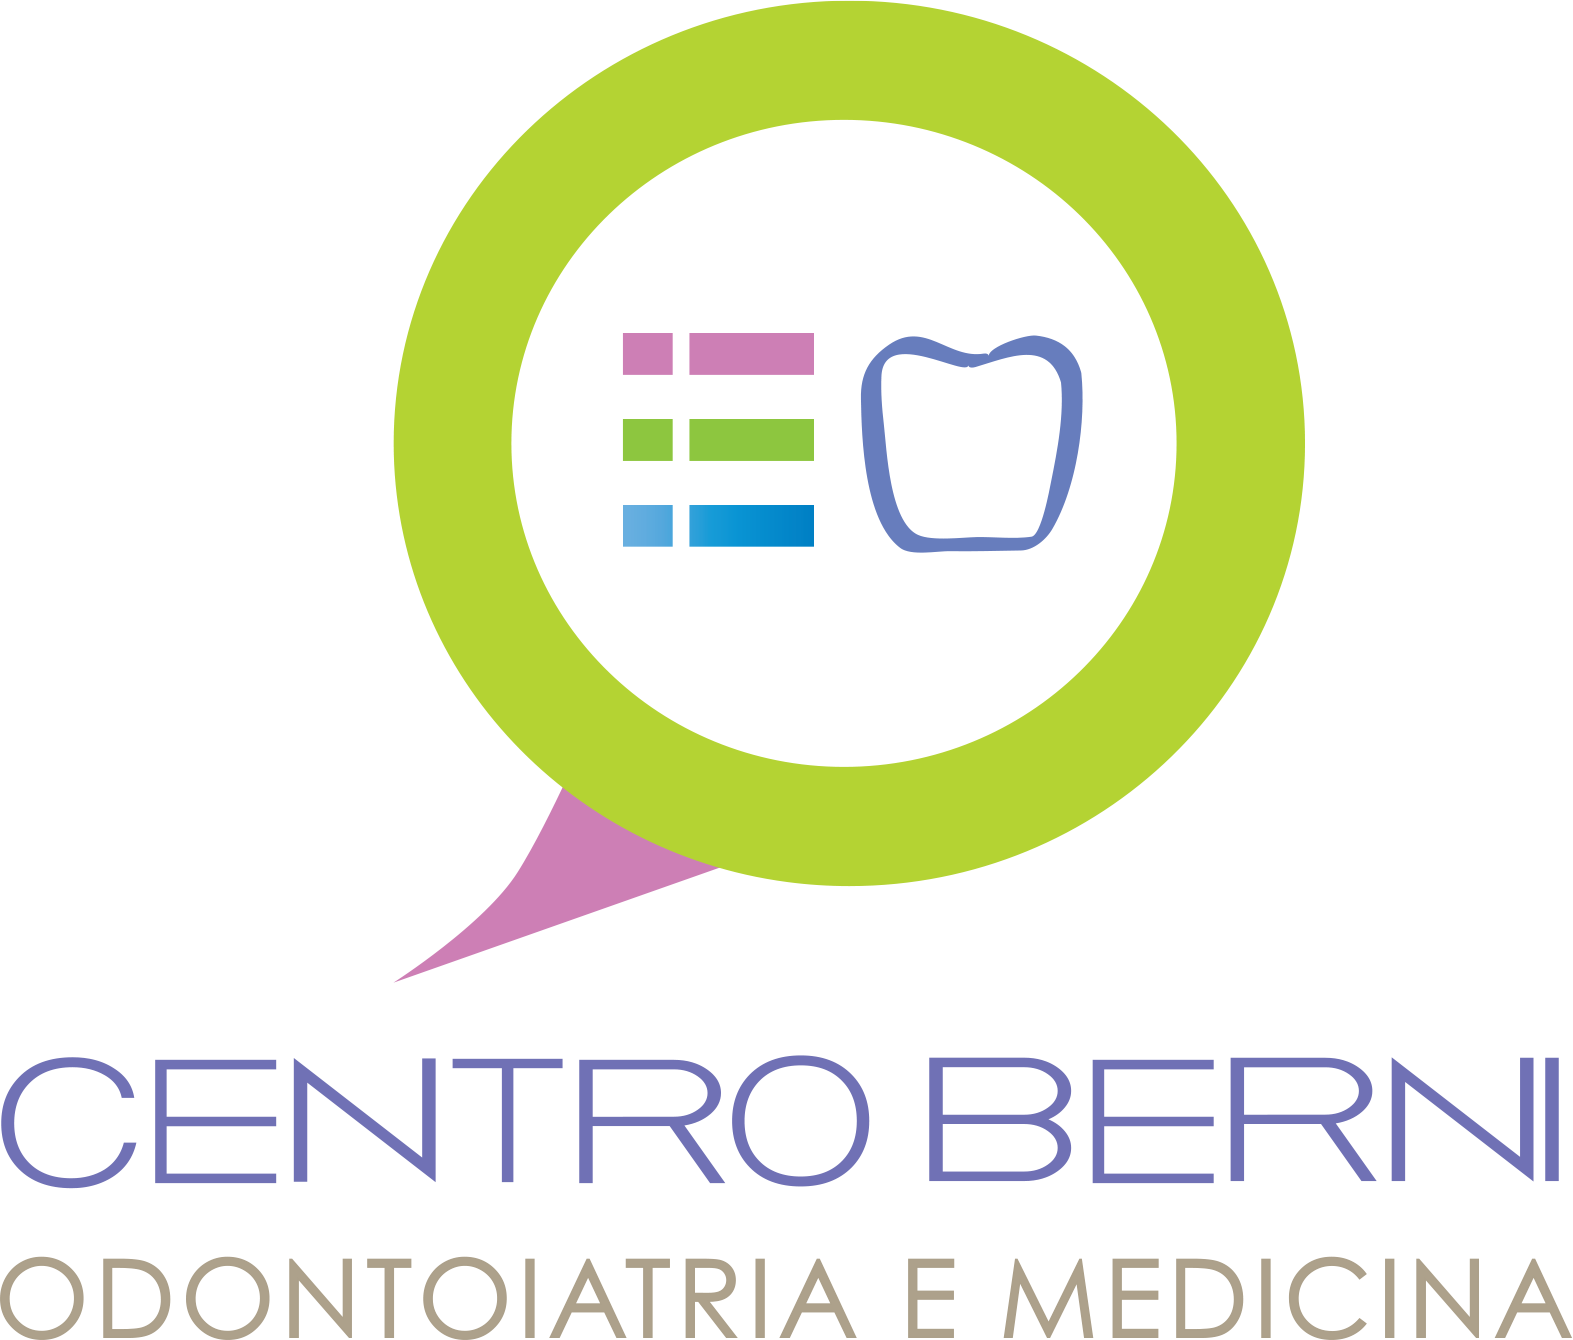 Berni Odontoiatria